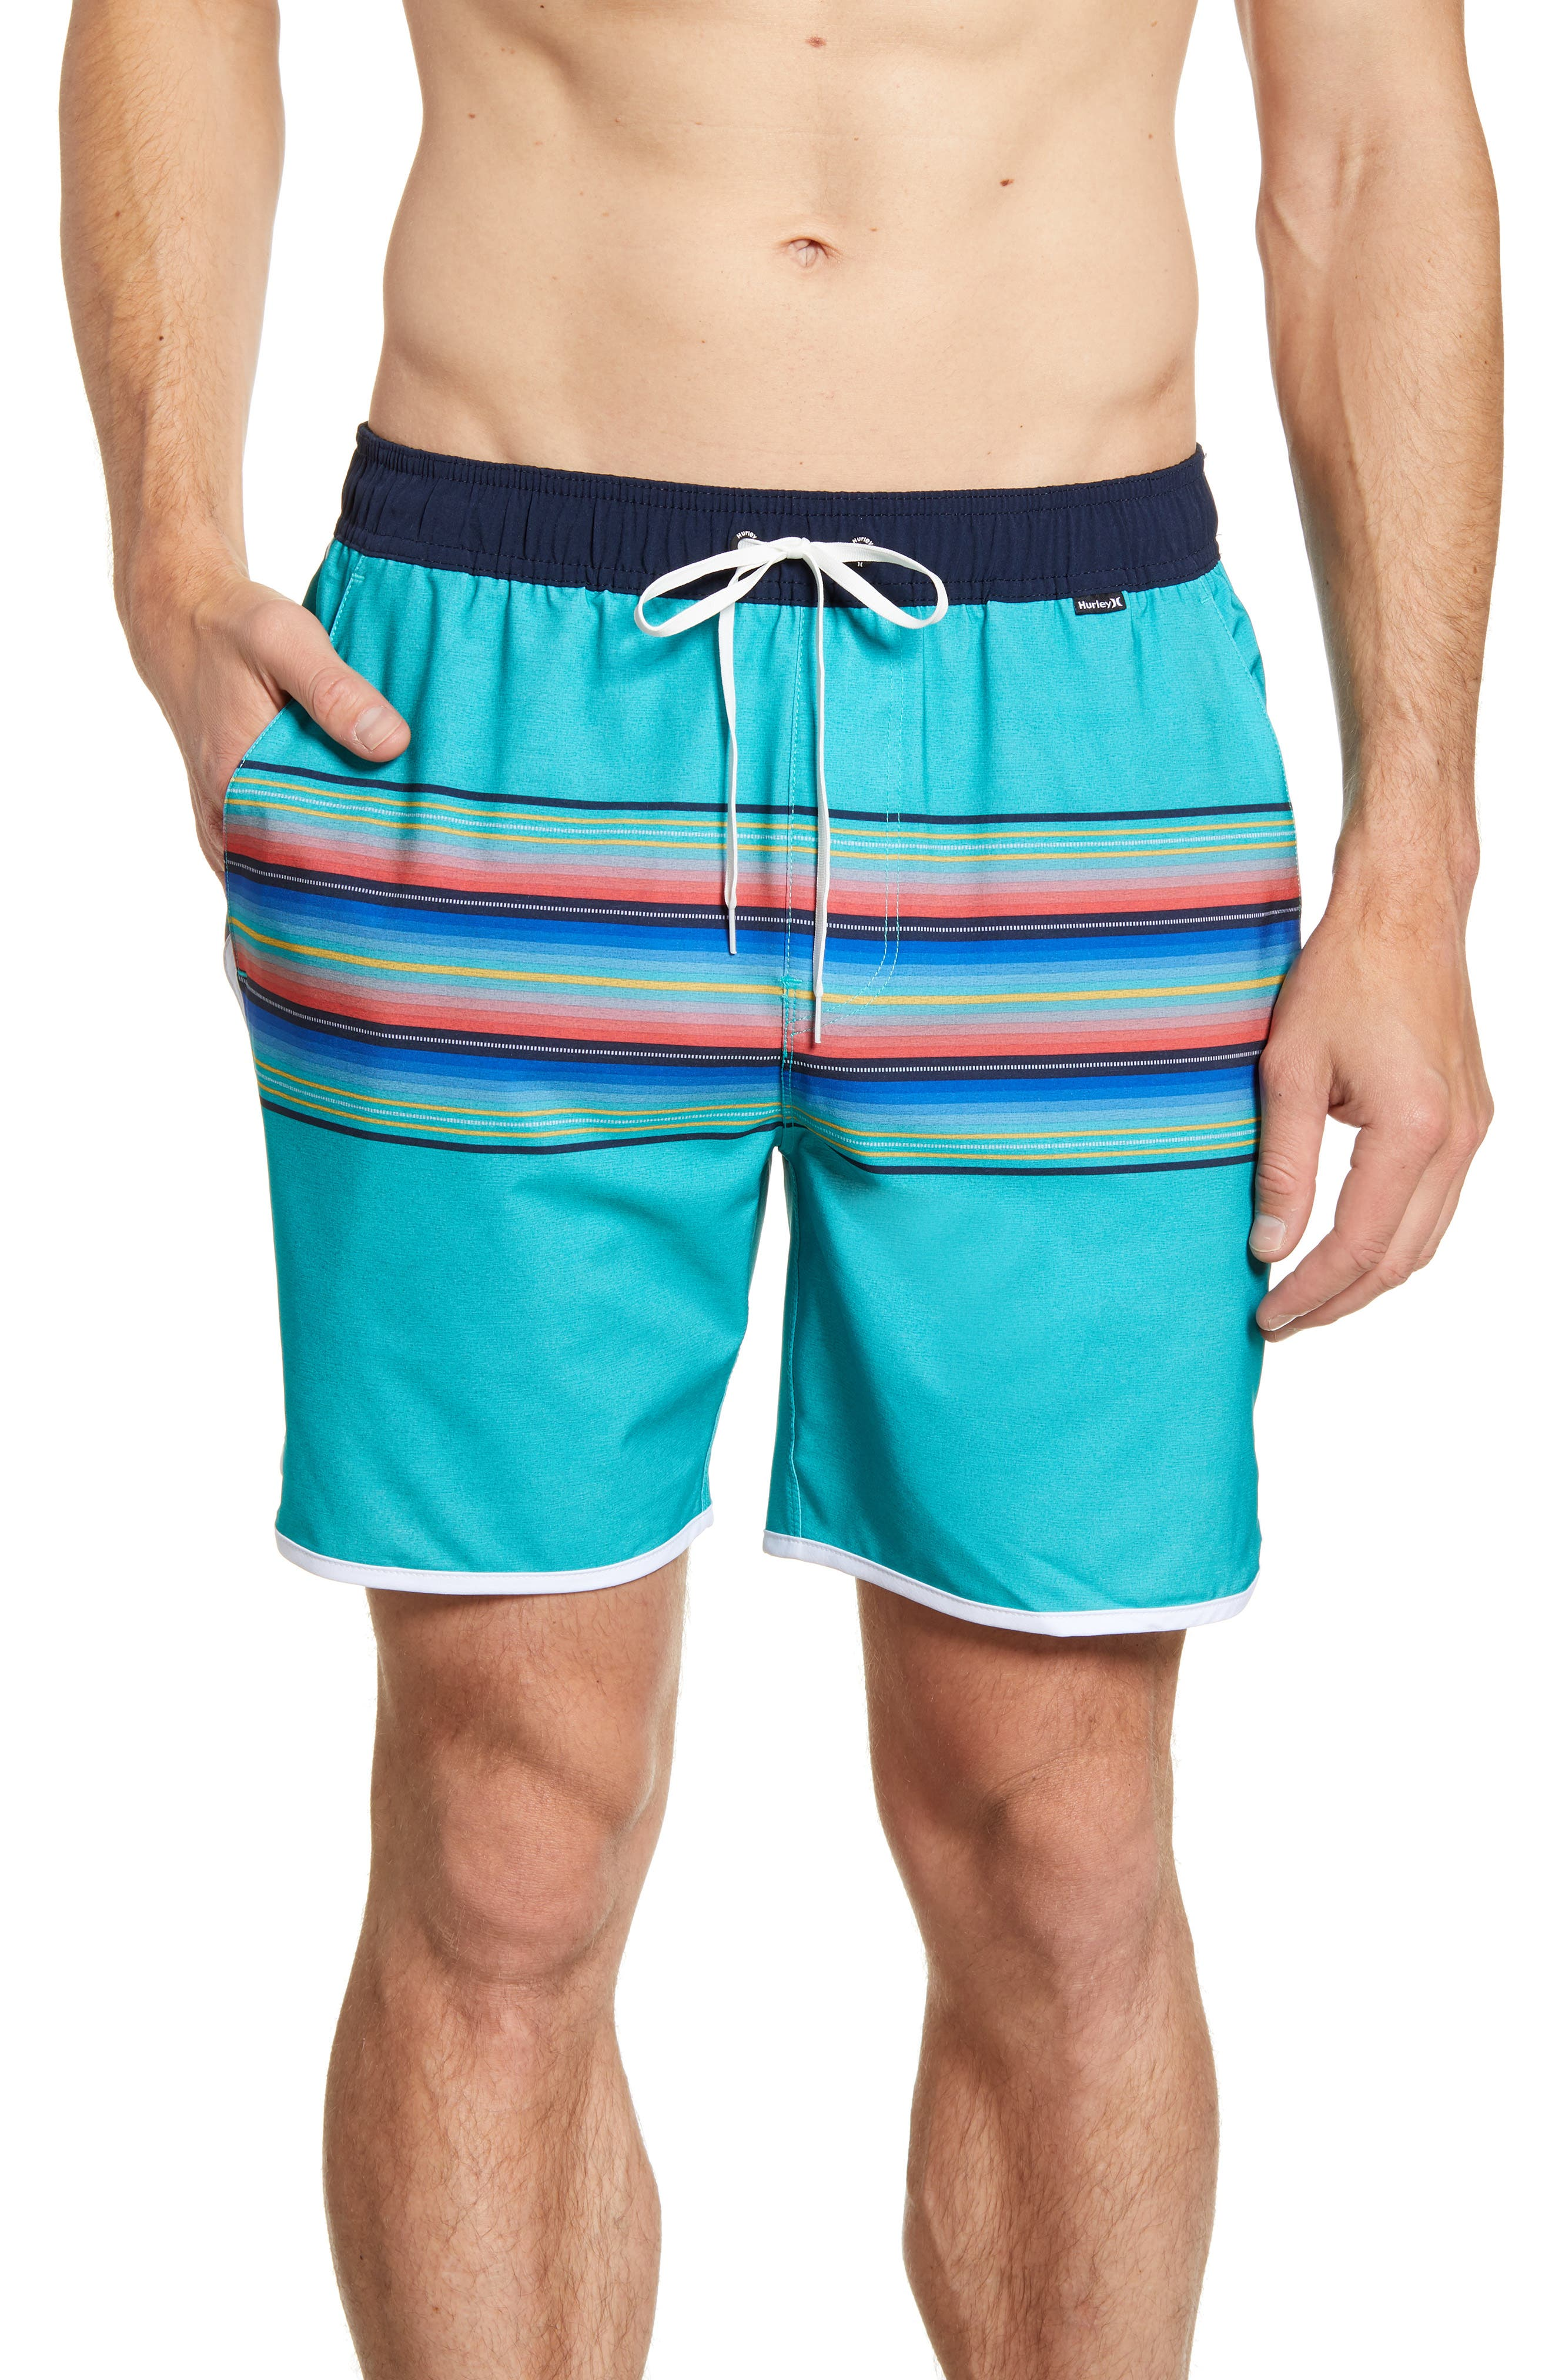 Hurley Phantom Baja Malibu Volley Swim Trunks, Blue/green